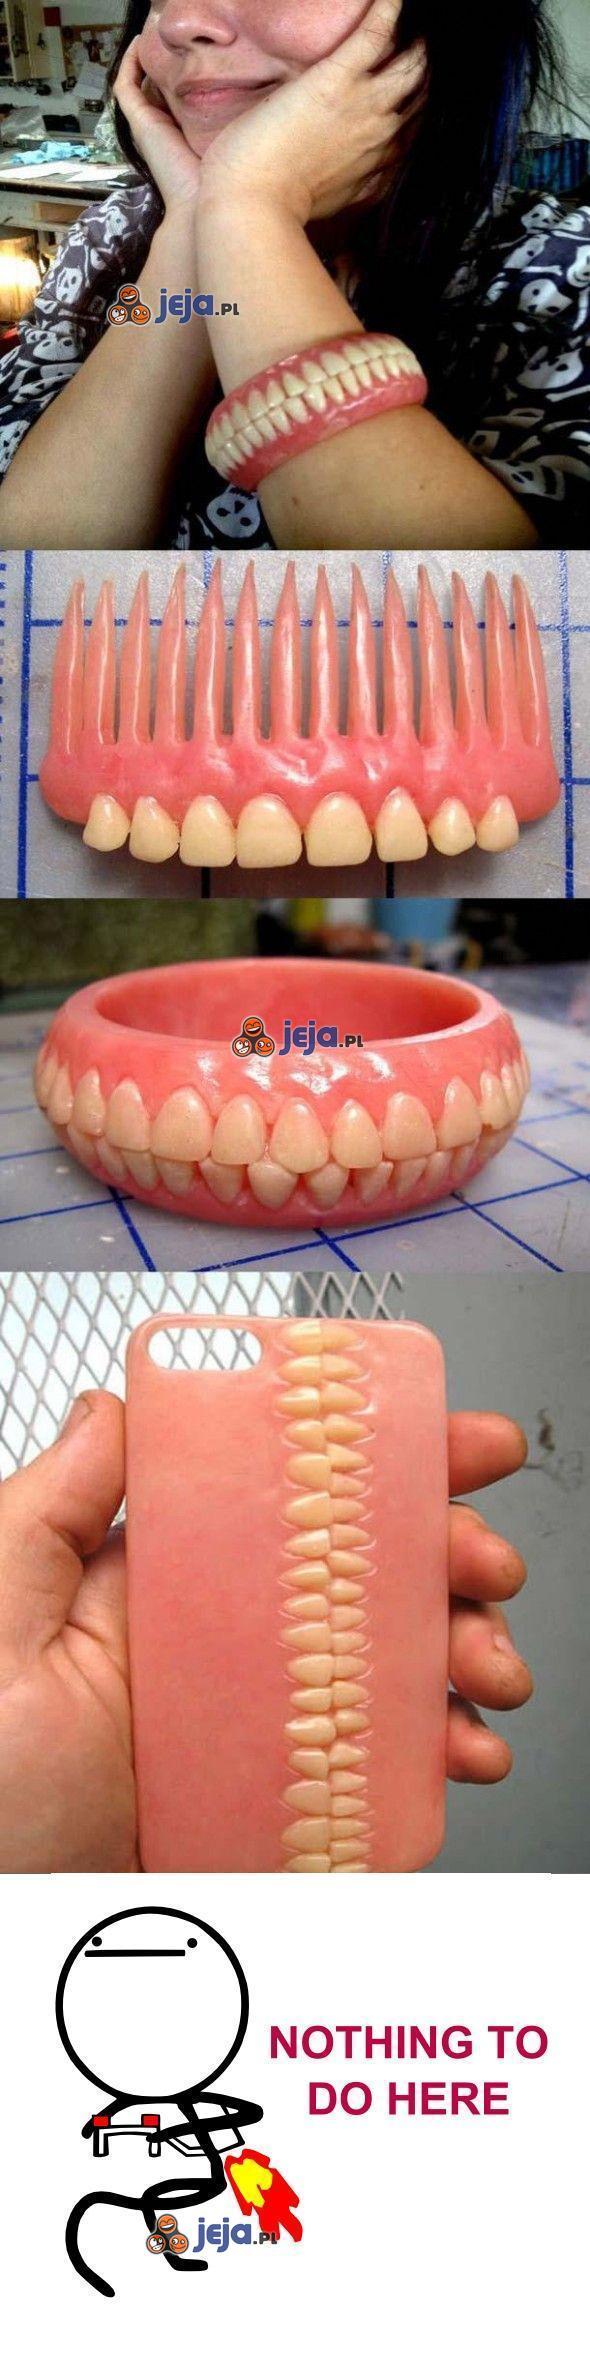 Moda na zęby...?